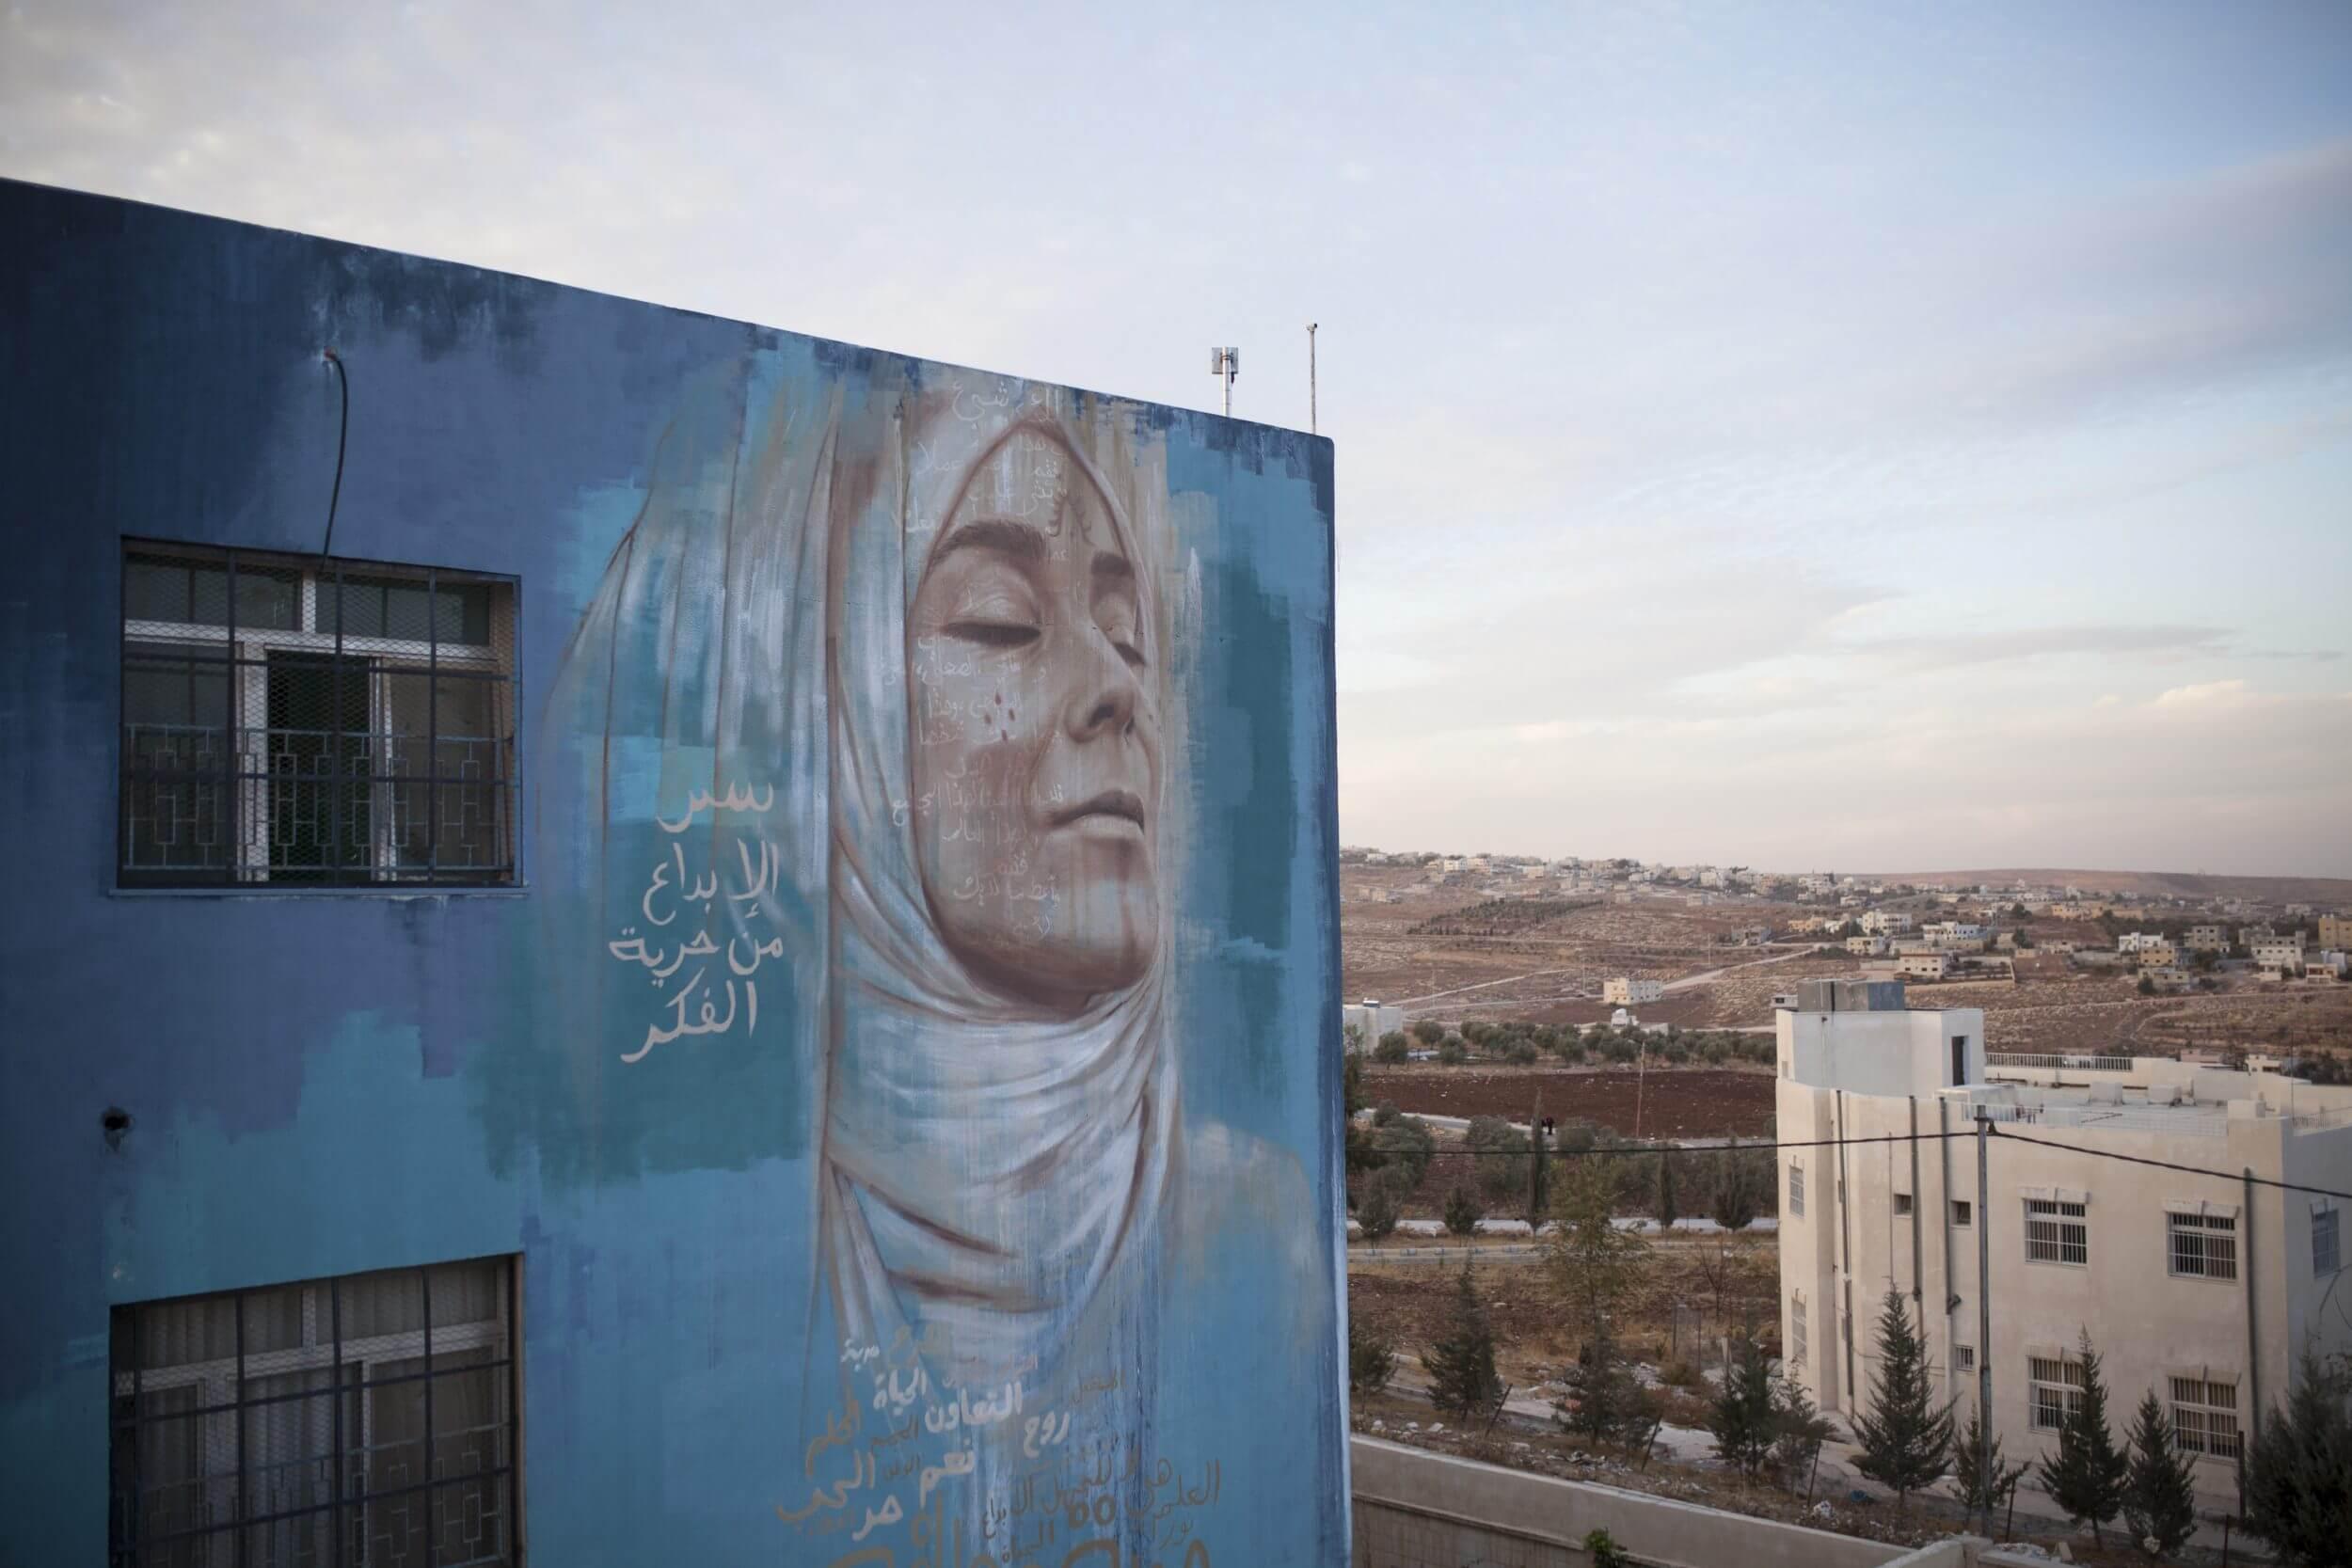 Recap of Thought Provoking Street Art Murals in 2016